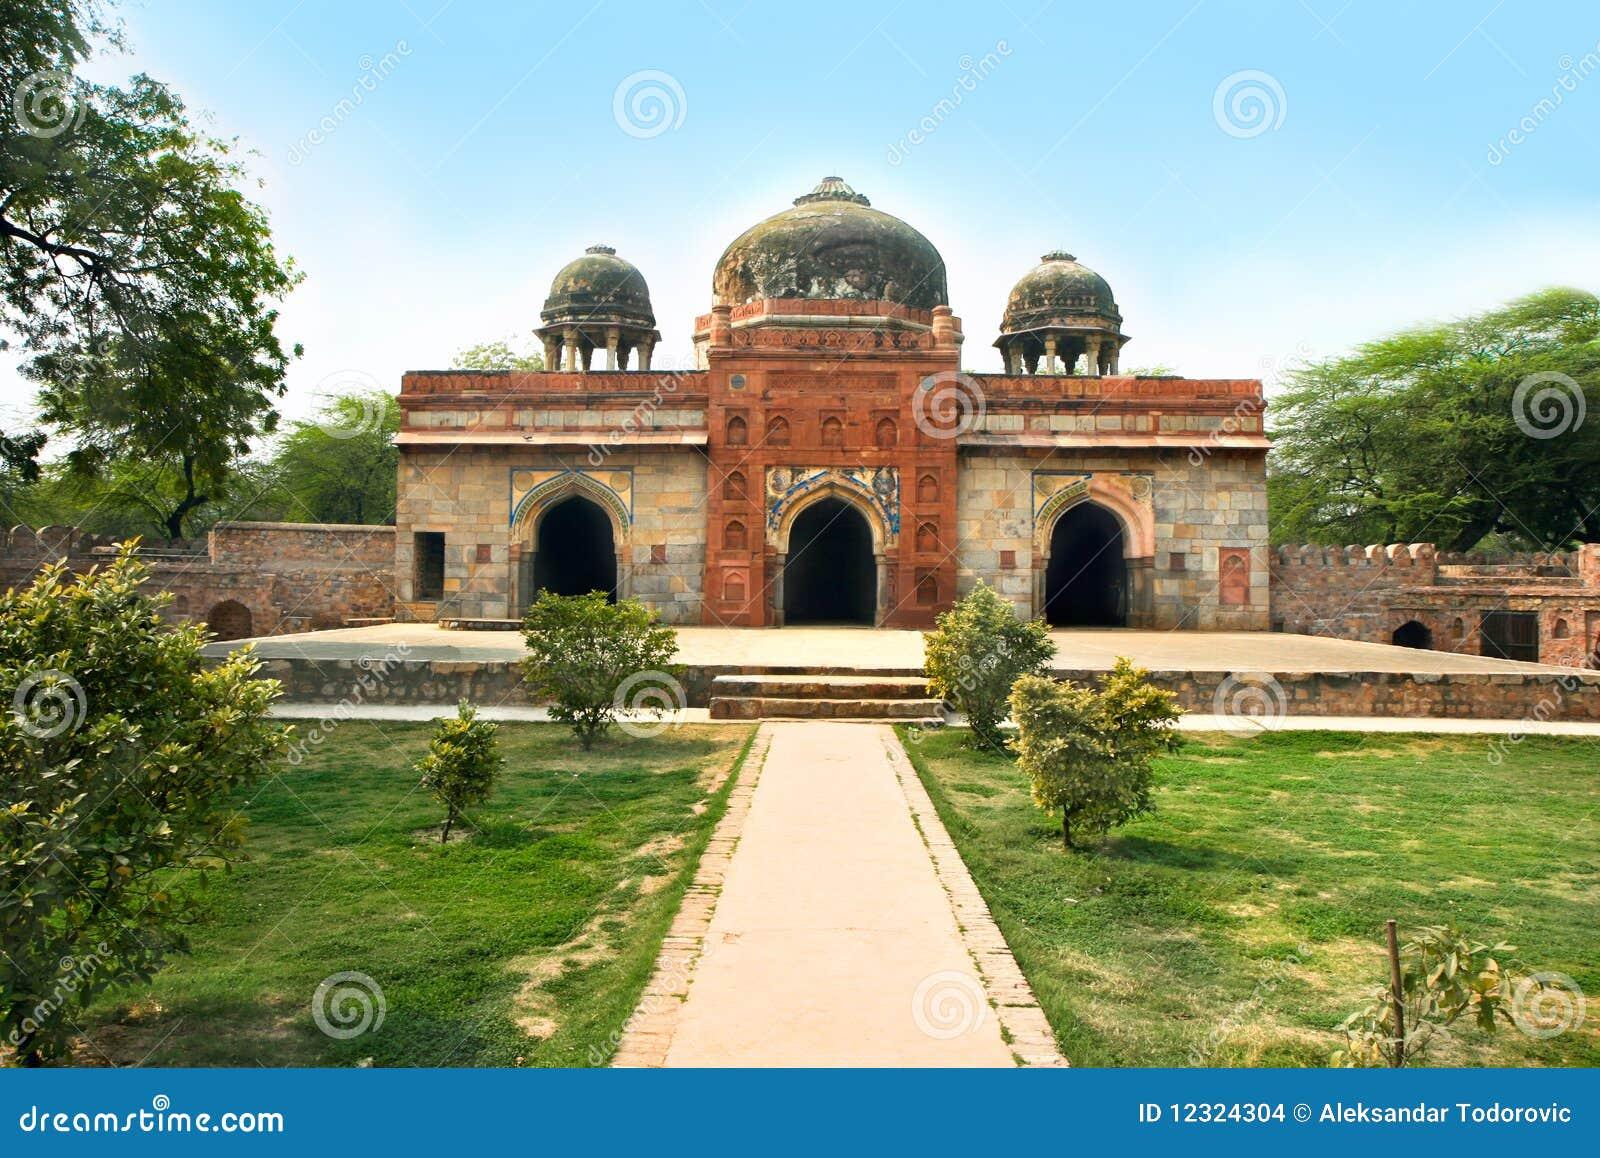 Сад Lodi в городе Дели, Индии